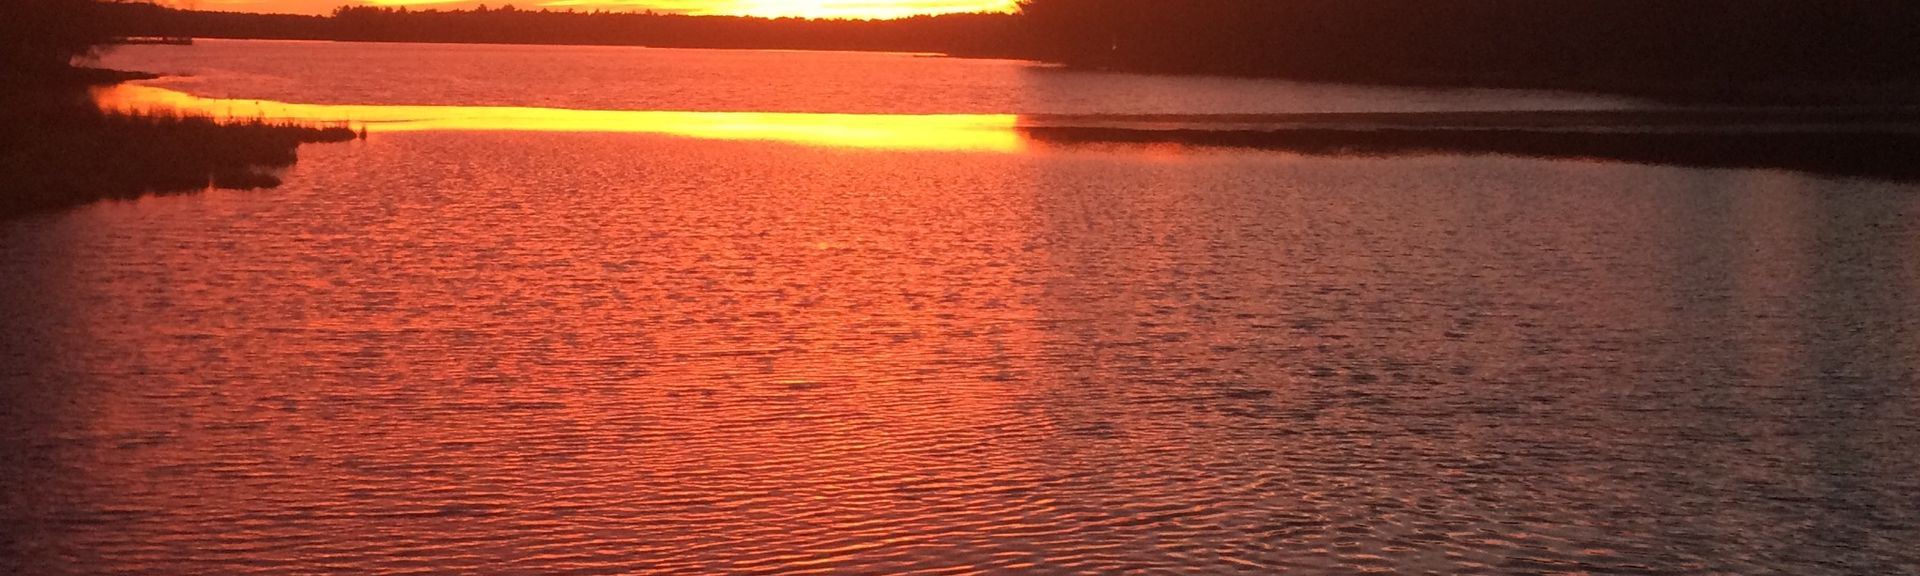 Hartland, Maine, United States of America